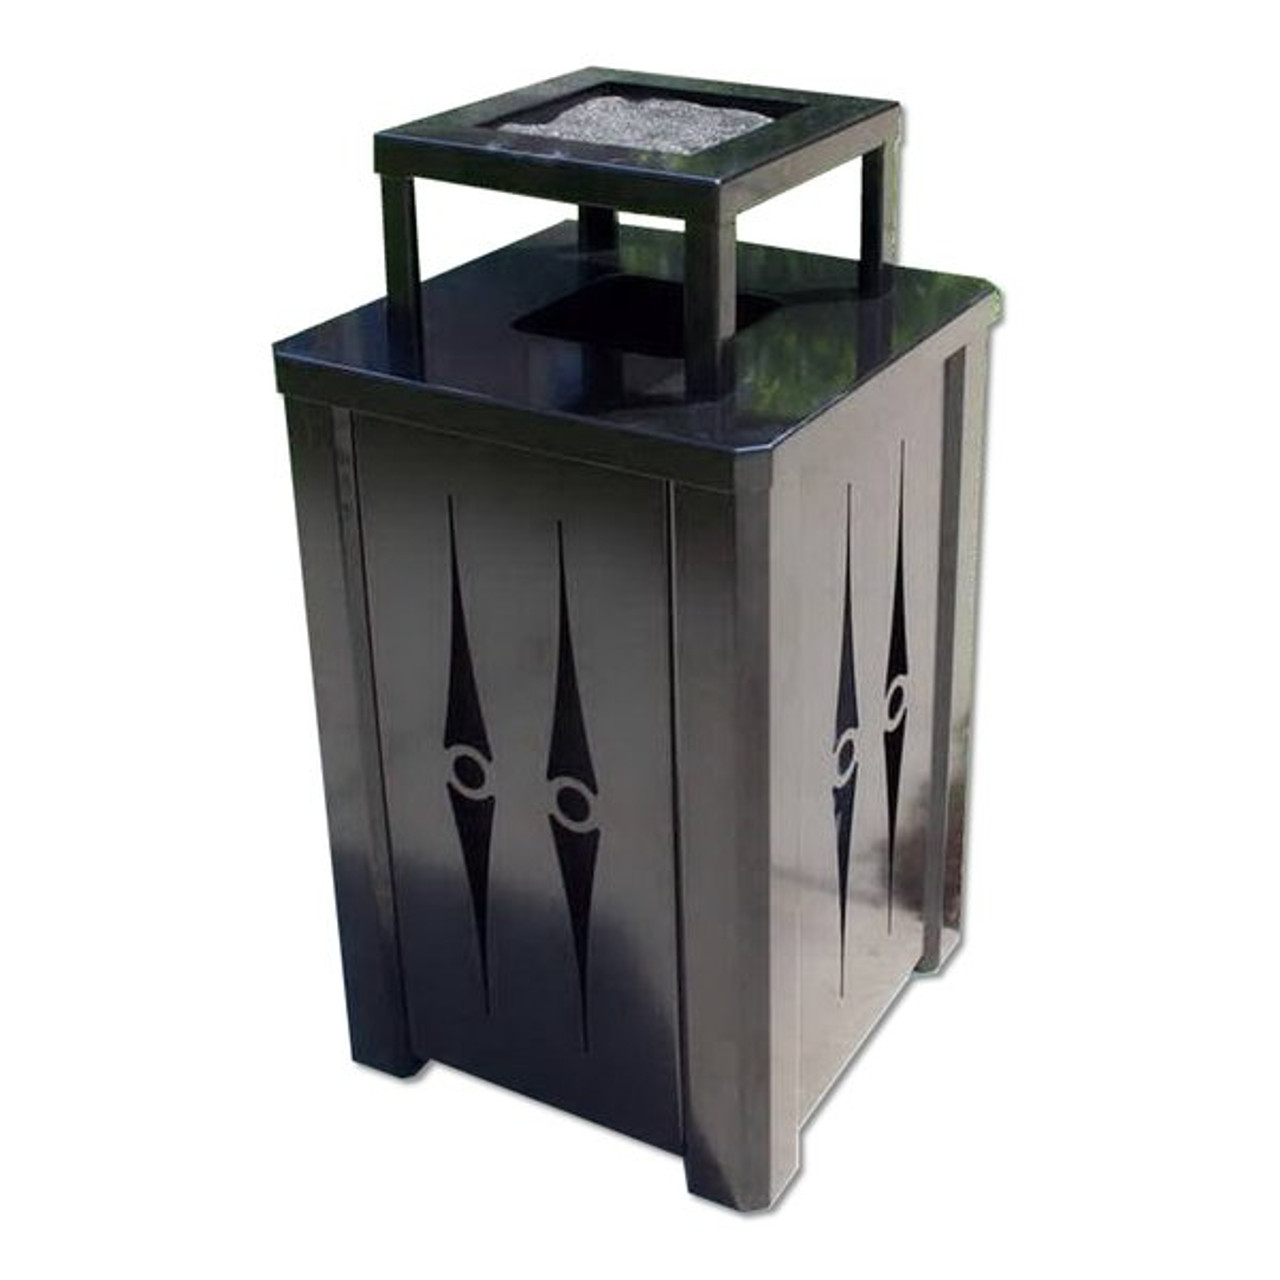 32 Gallon Ashtray Top Metal Trash Can S8050 (5 Body Styles)